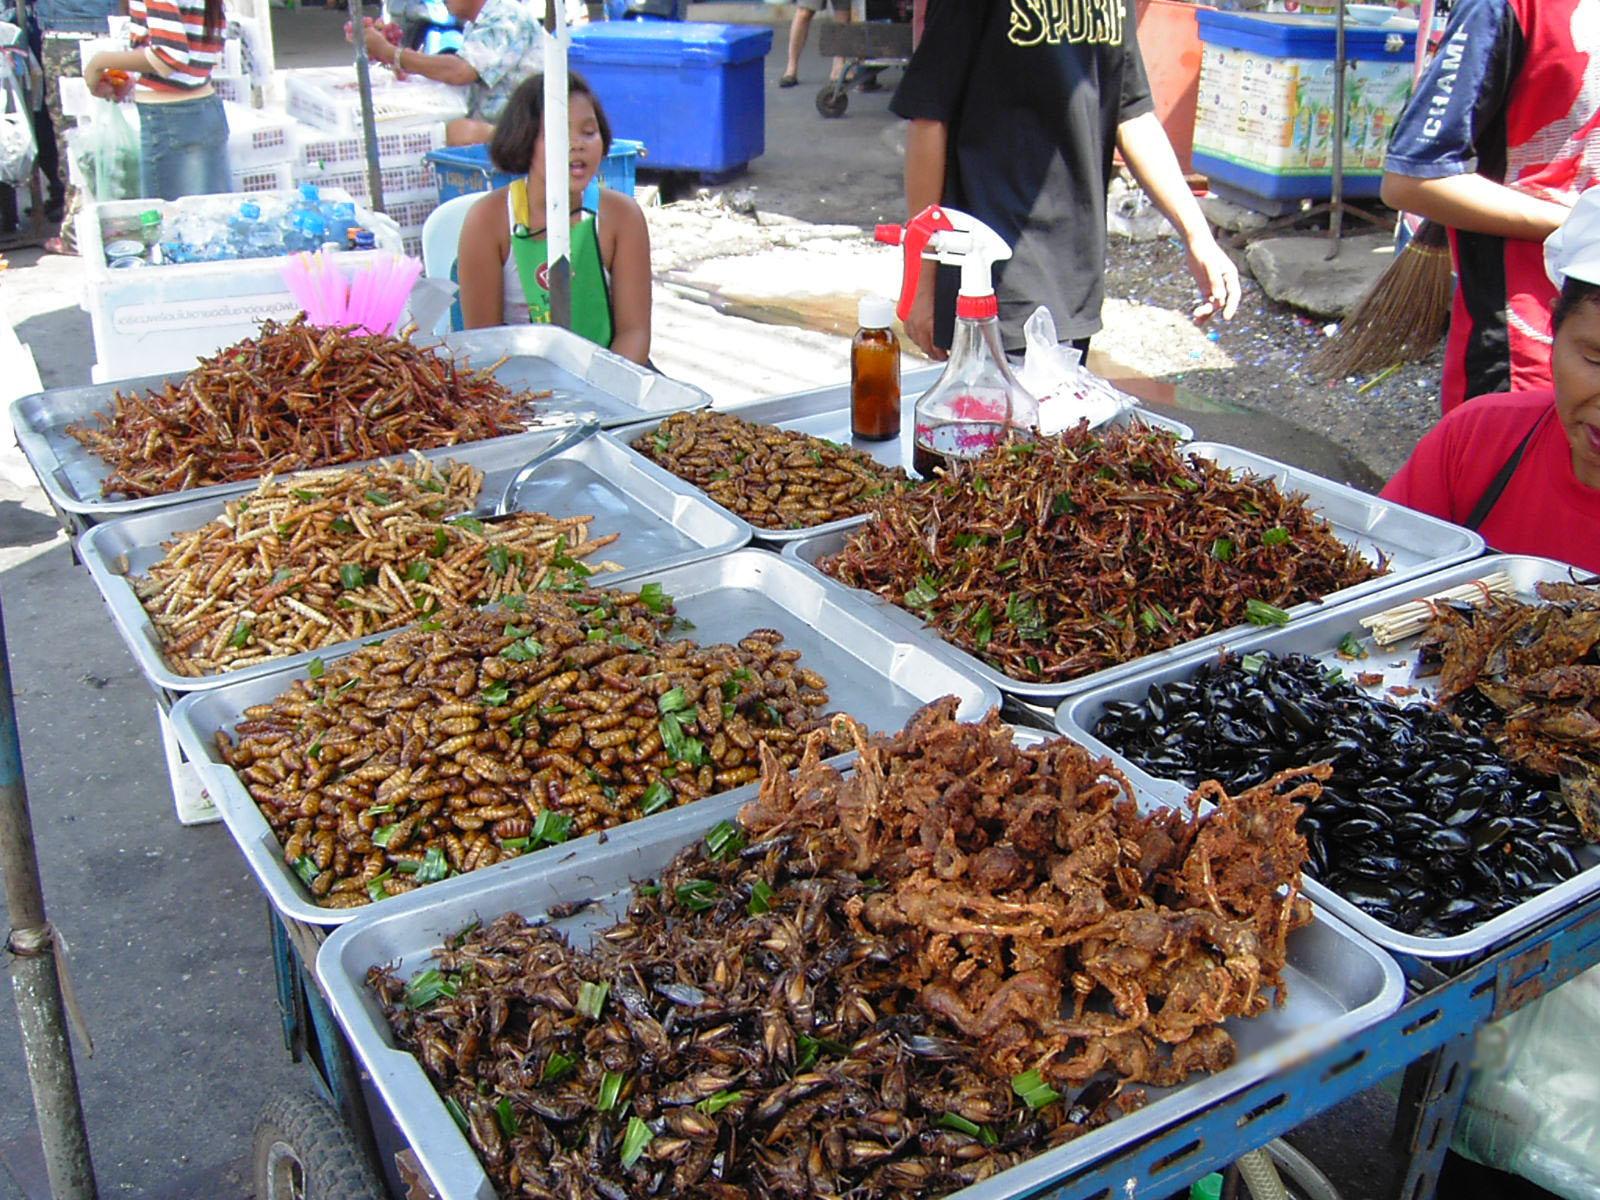 Ini alasan kamu kudu makan serangga